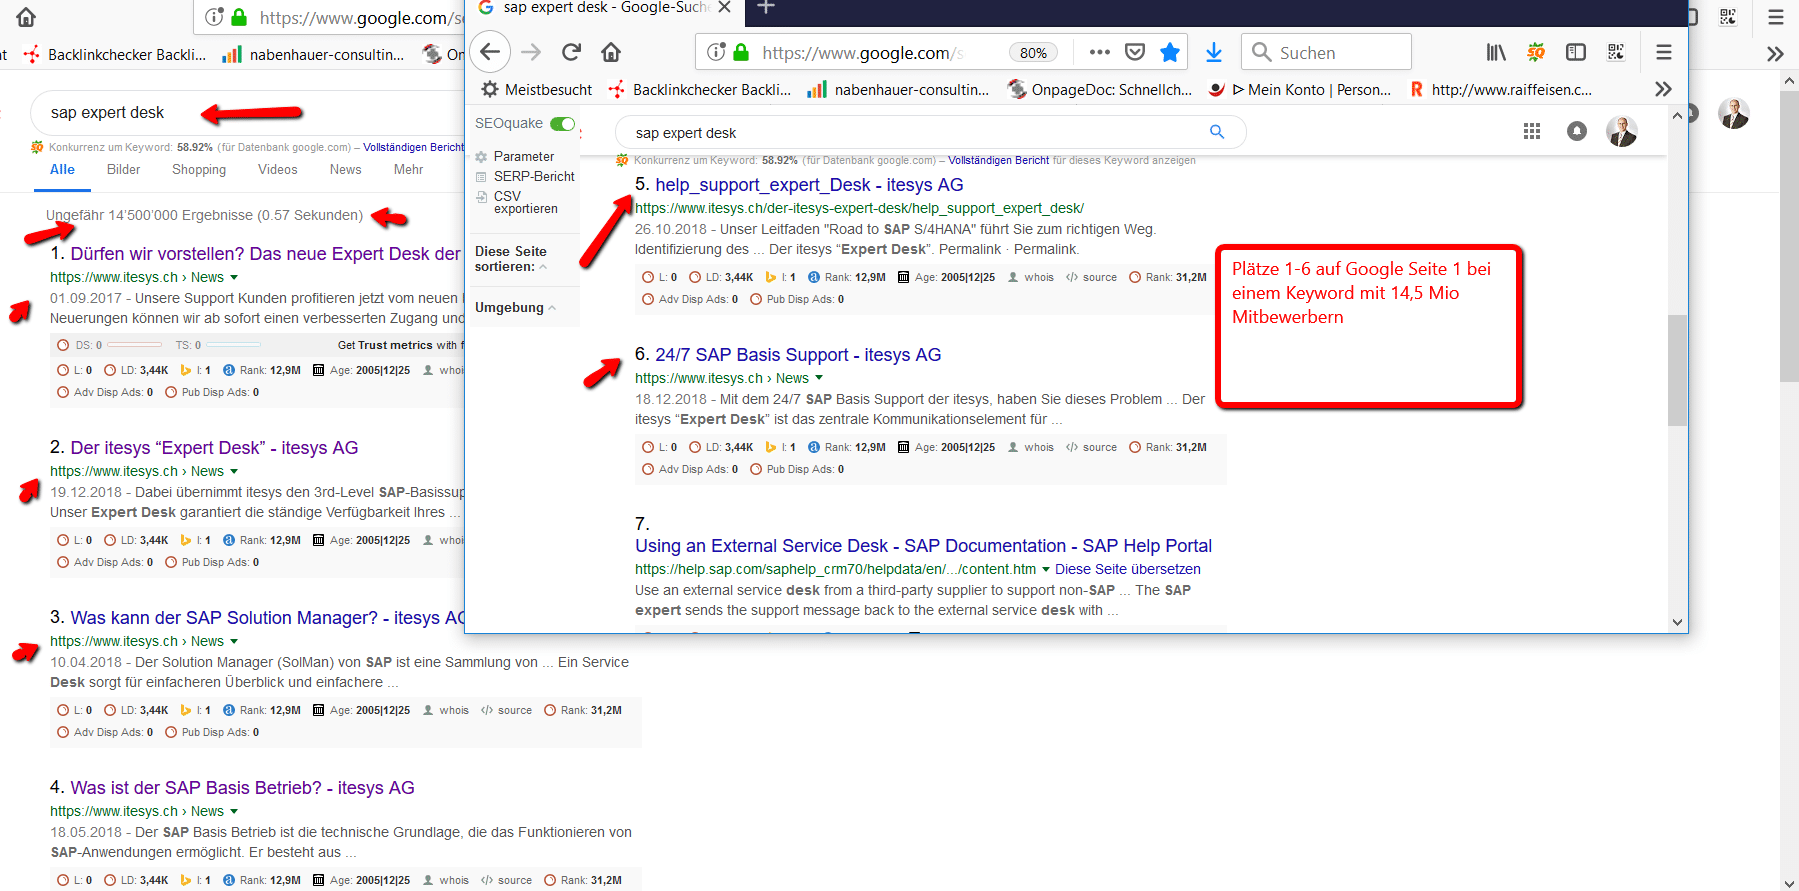 keyword_sap_expert_desk